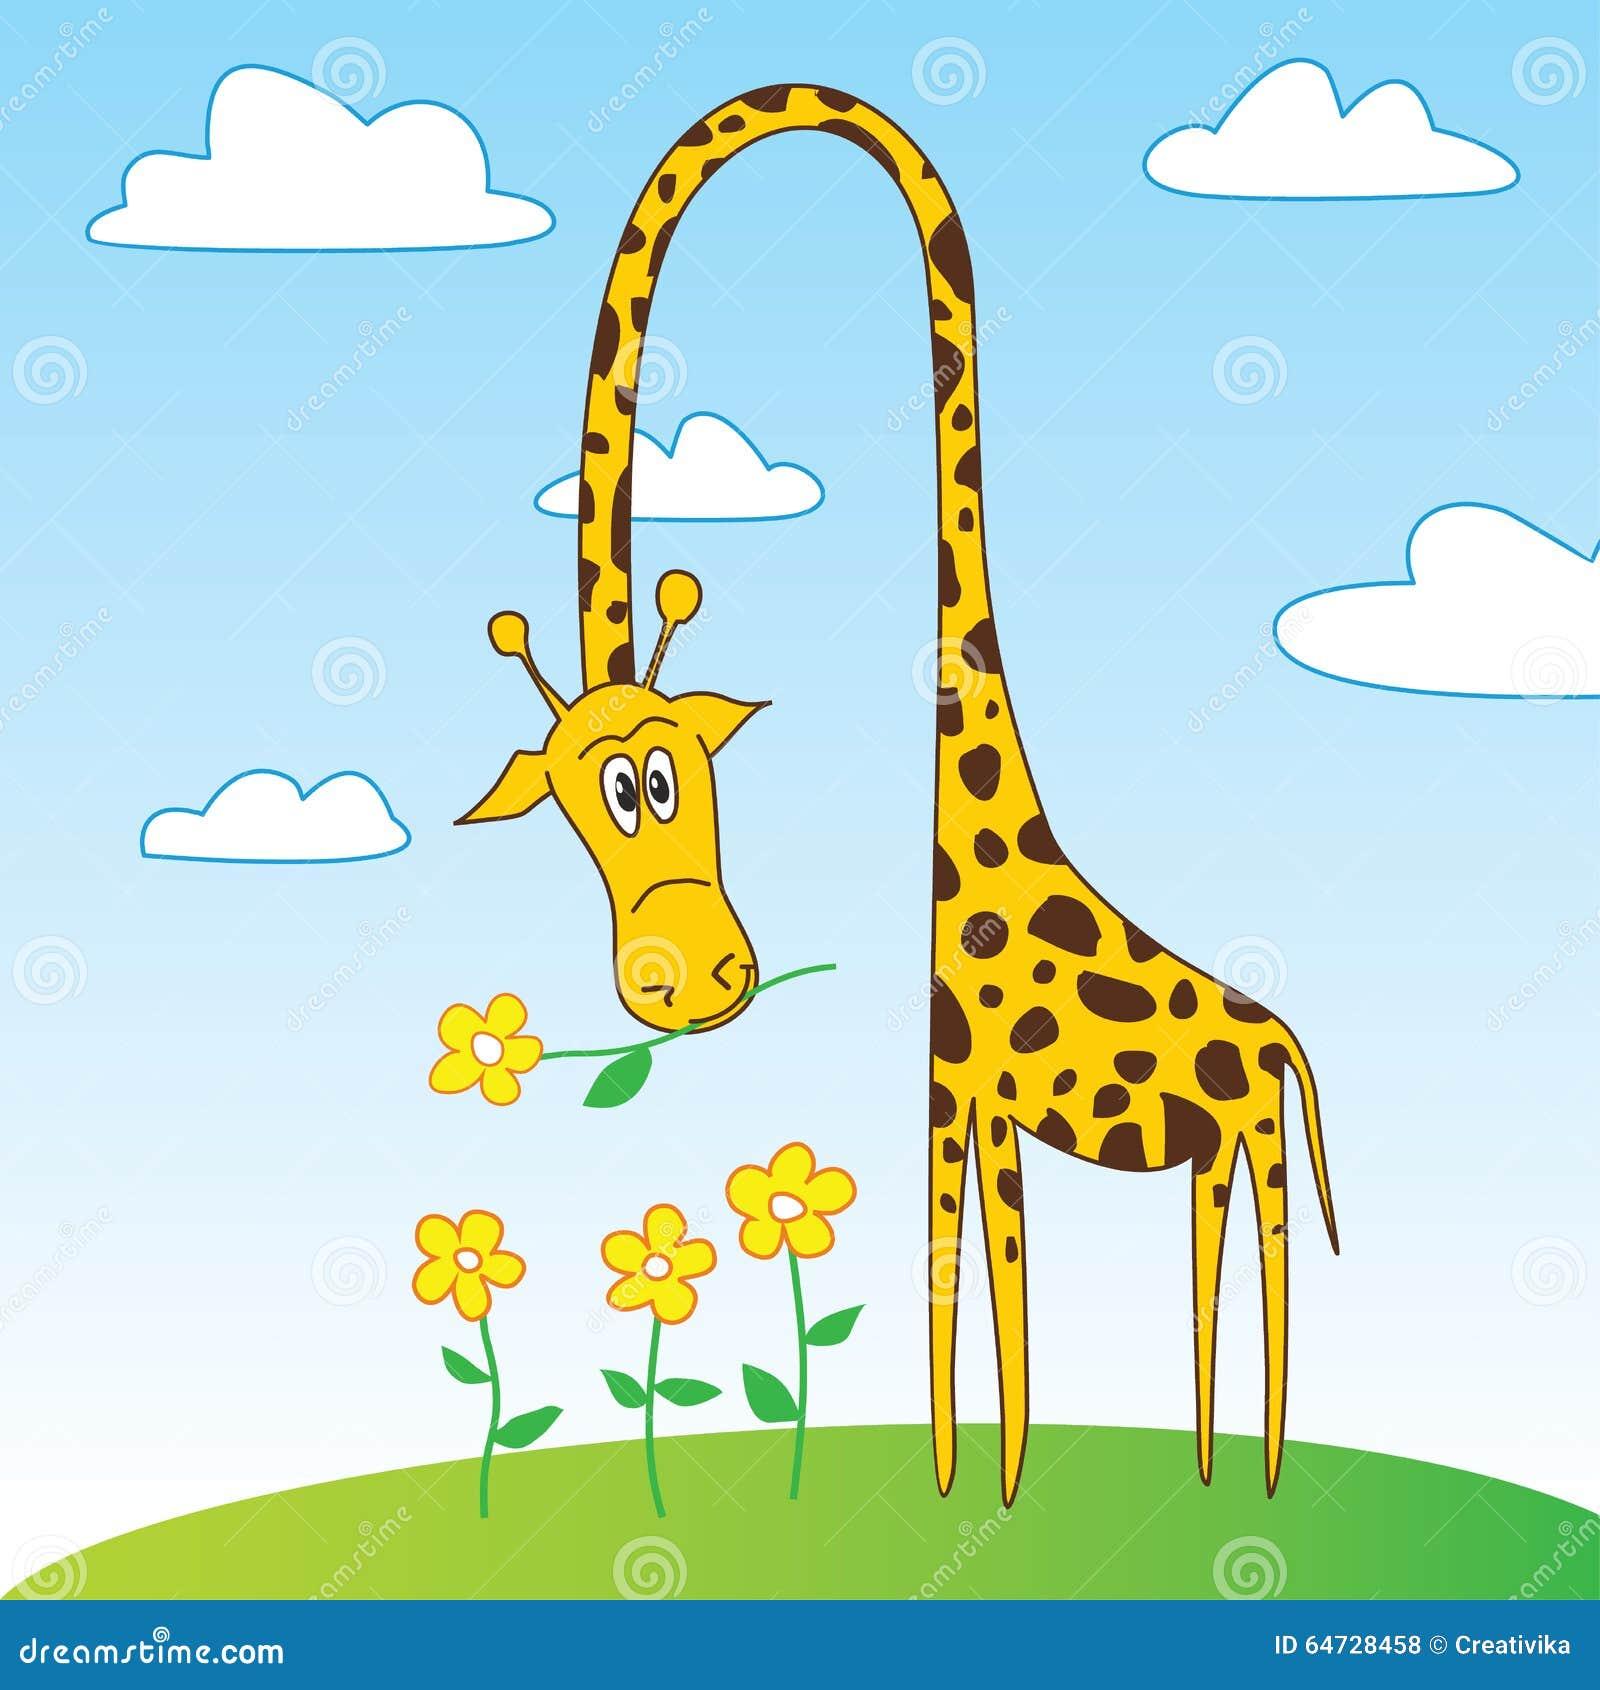 funny giraffe comic